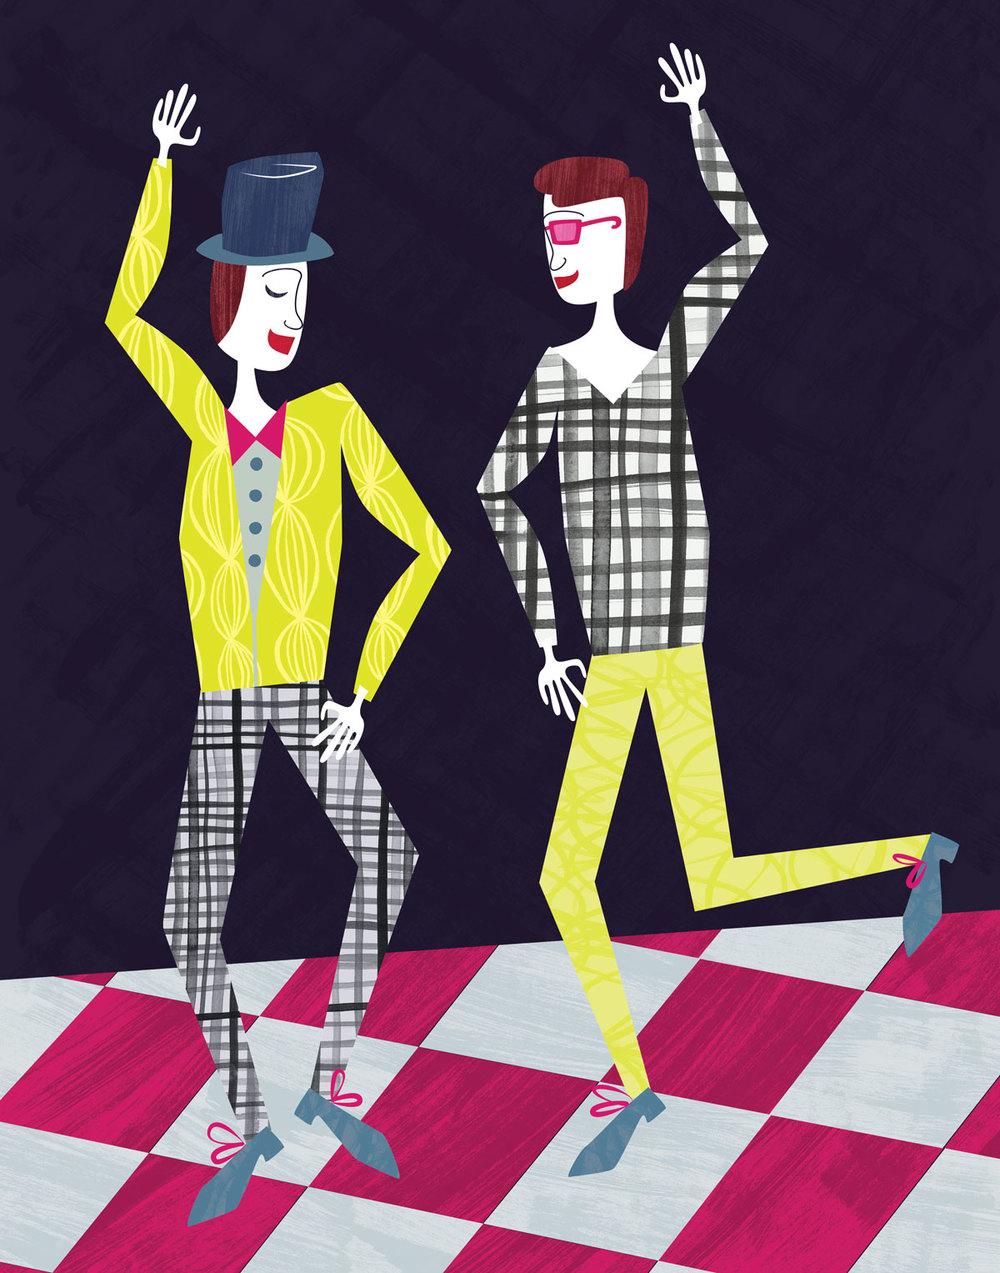 DancingDudesByBrynaShields.jpg